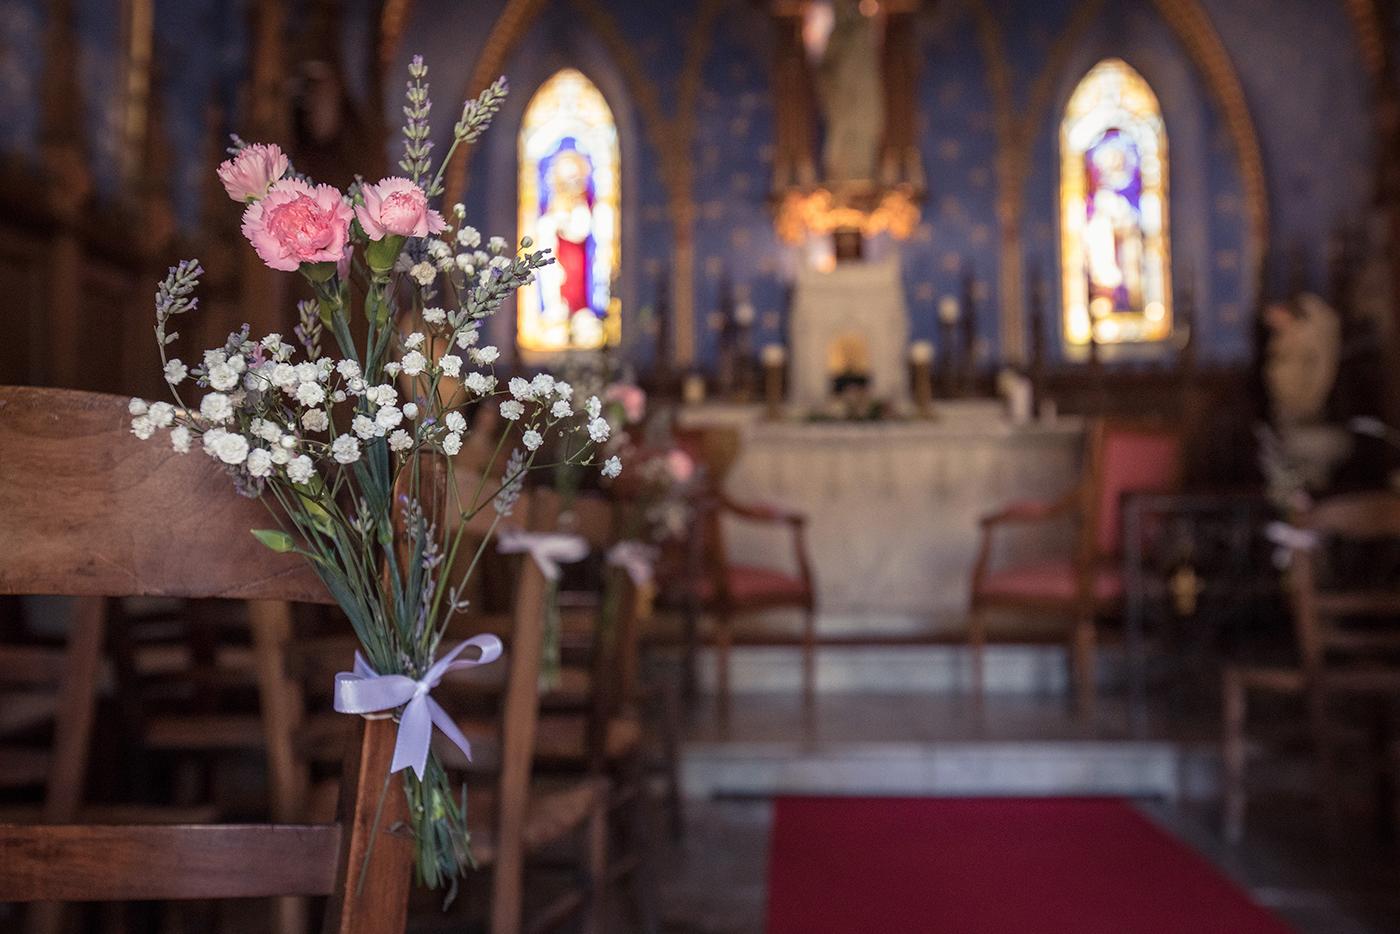 Photographe-mariage-eglise-chapelle-guillaume-heraud-01